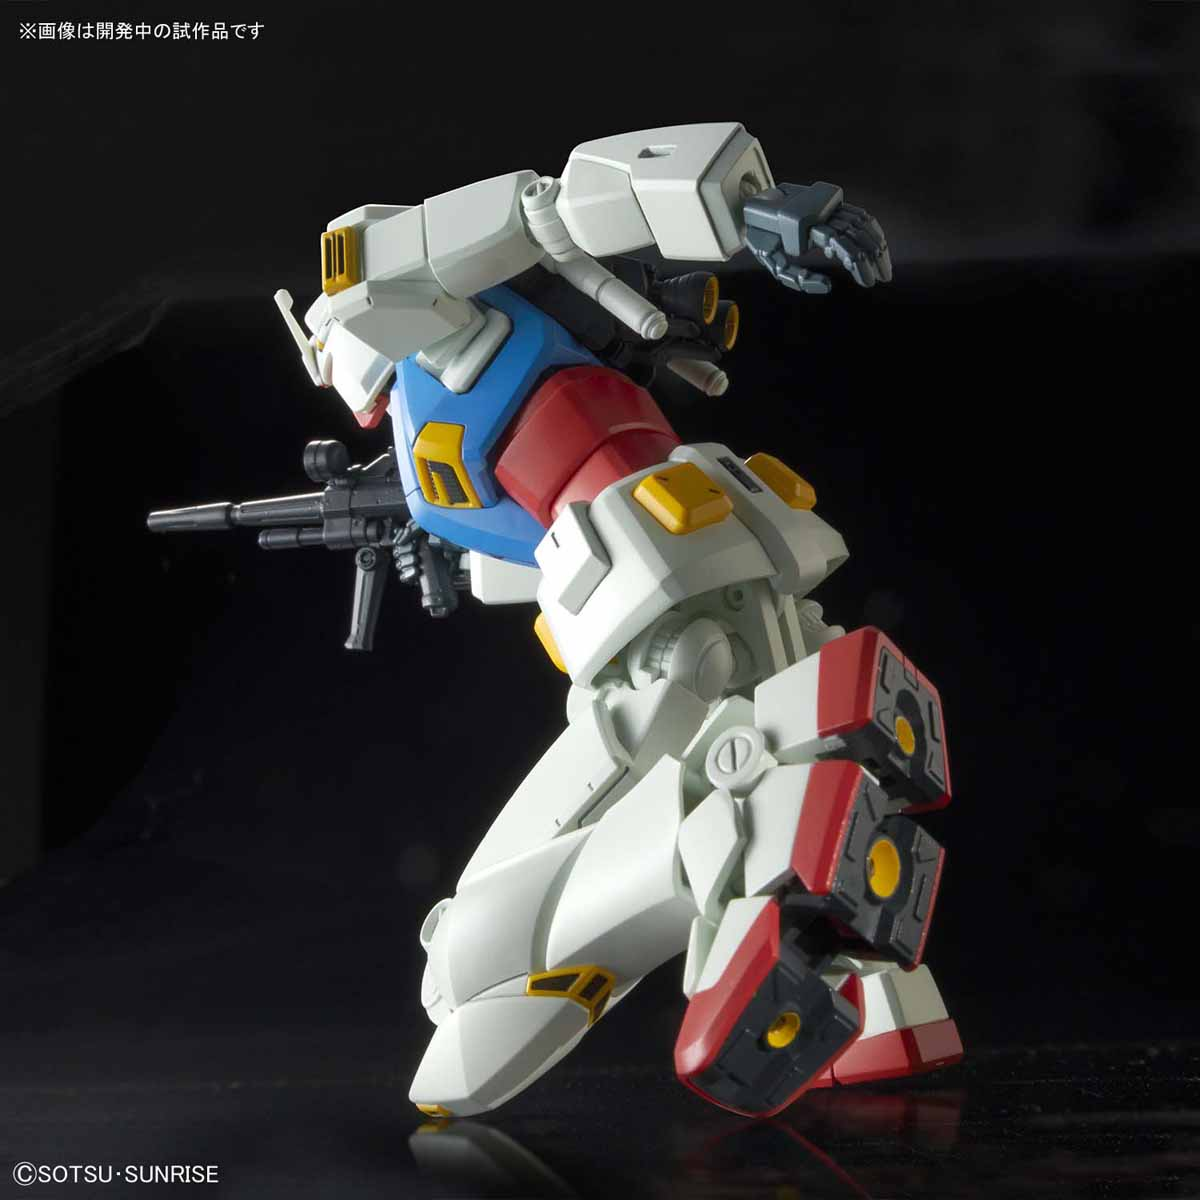 HG 1/144『ガンダムG40(Industrial Design Ver.)』プラモデル-002